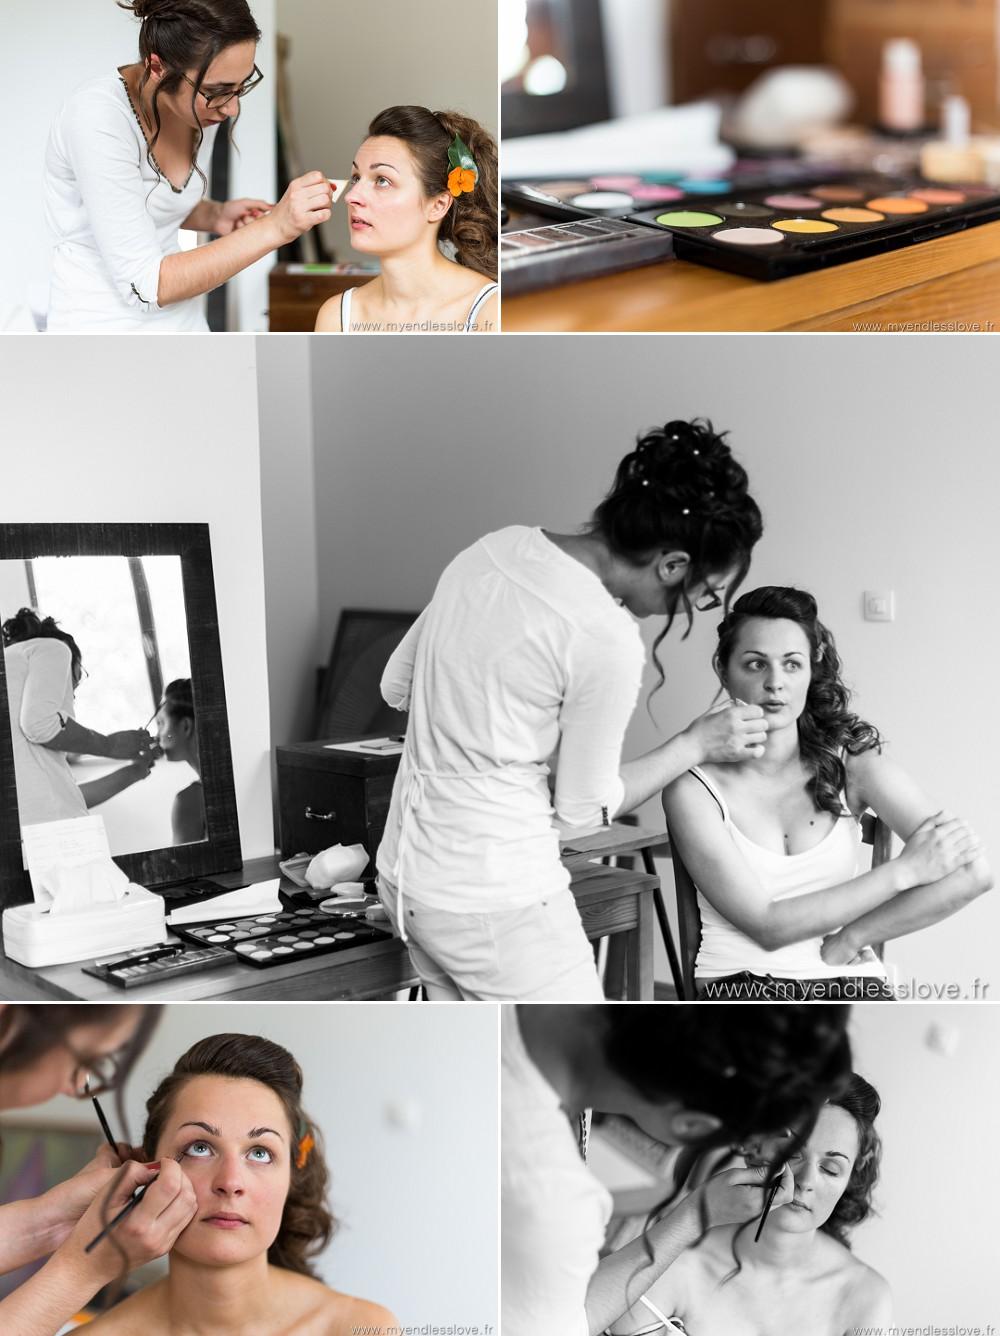 myendlesslove-photographe-mariage-lille-2-henin-beaumont-préparatifs-mariee-melanie-reichhart (1)